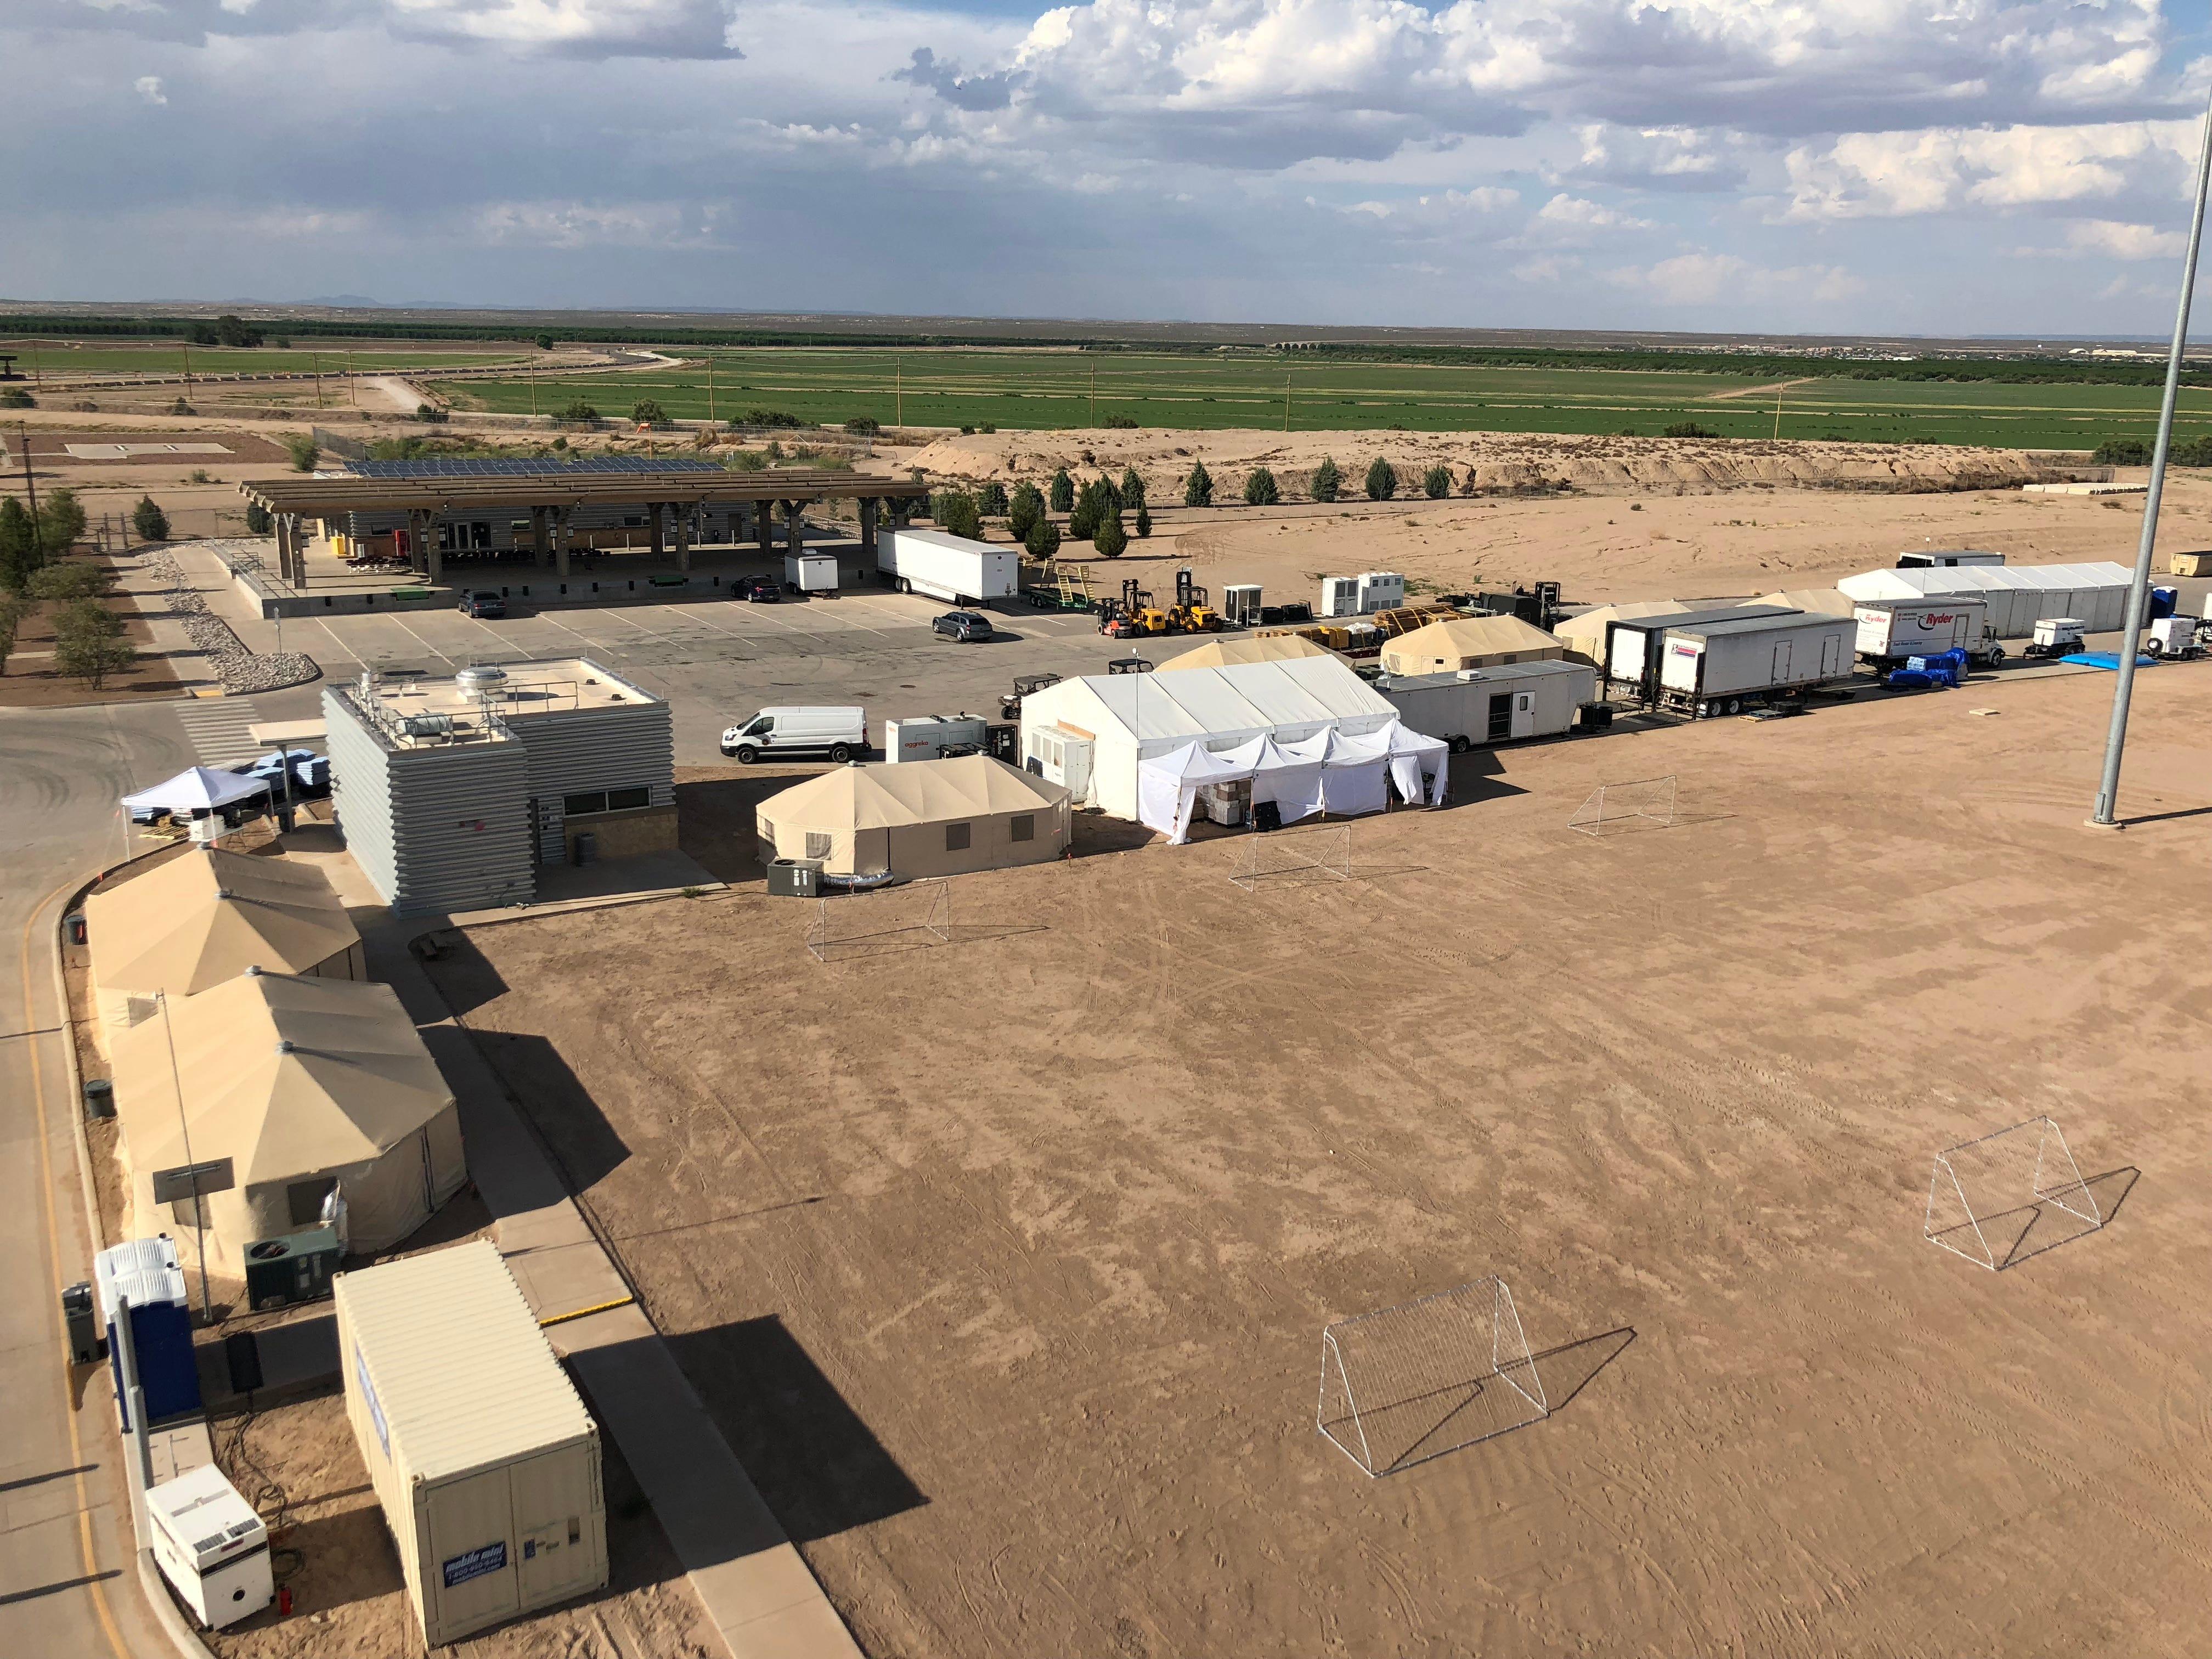 Homeland Security Secretary Kirstjen Nielsen drafts plan to end family separation | El Paso Times